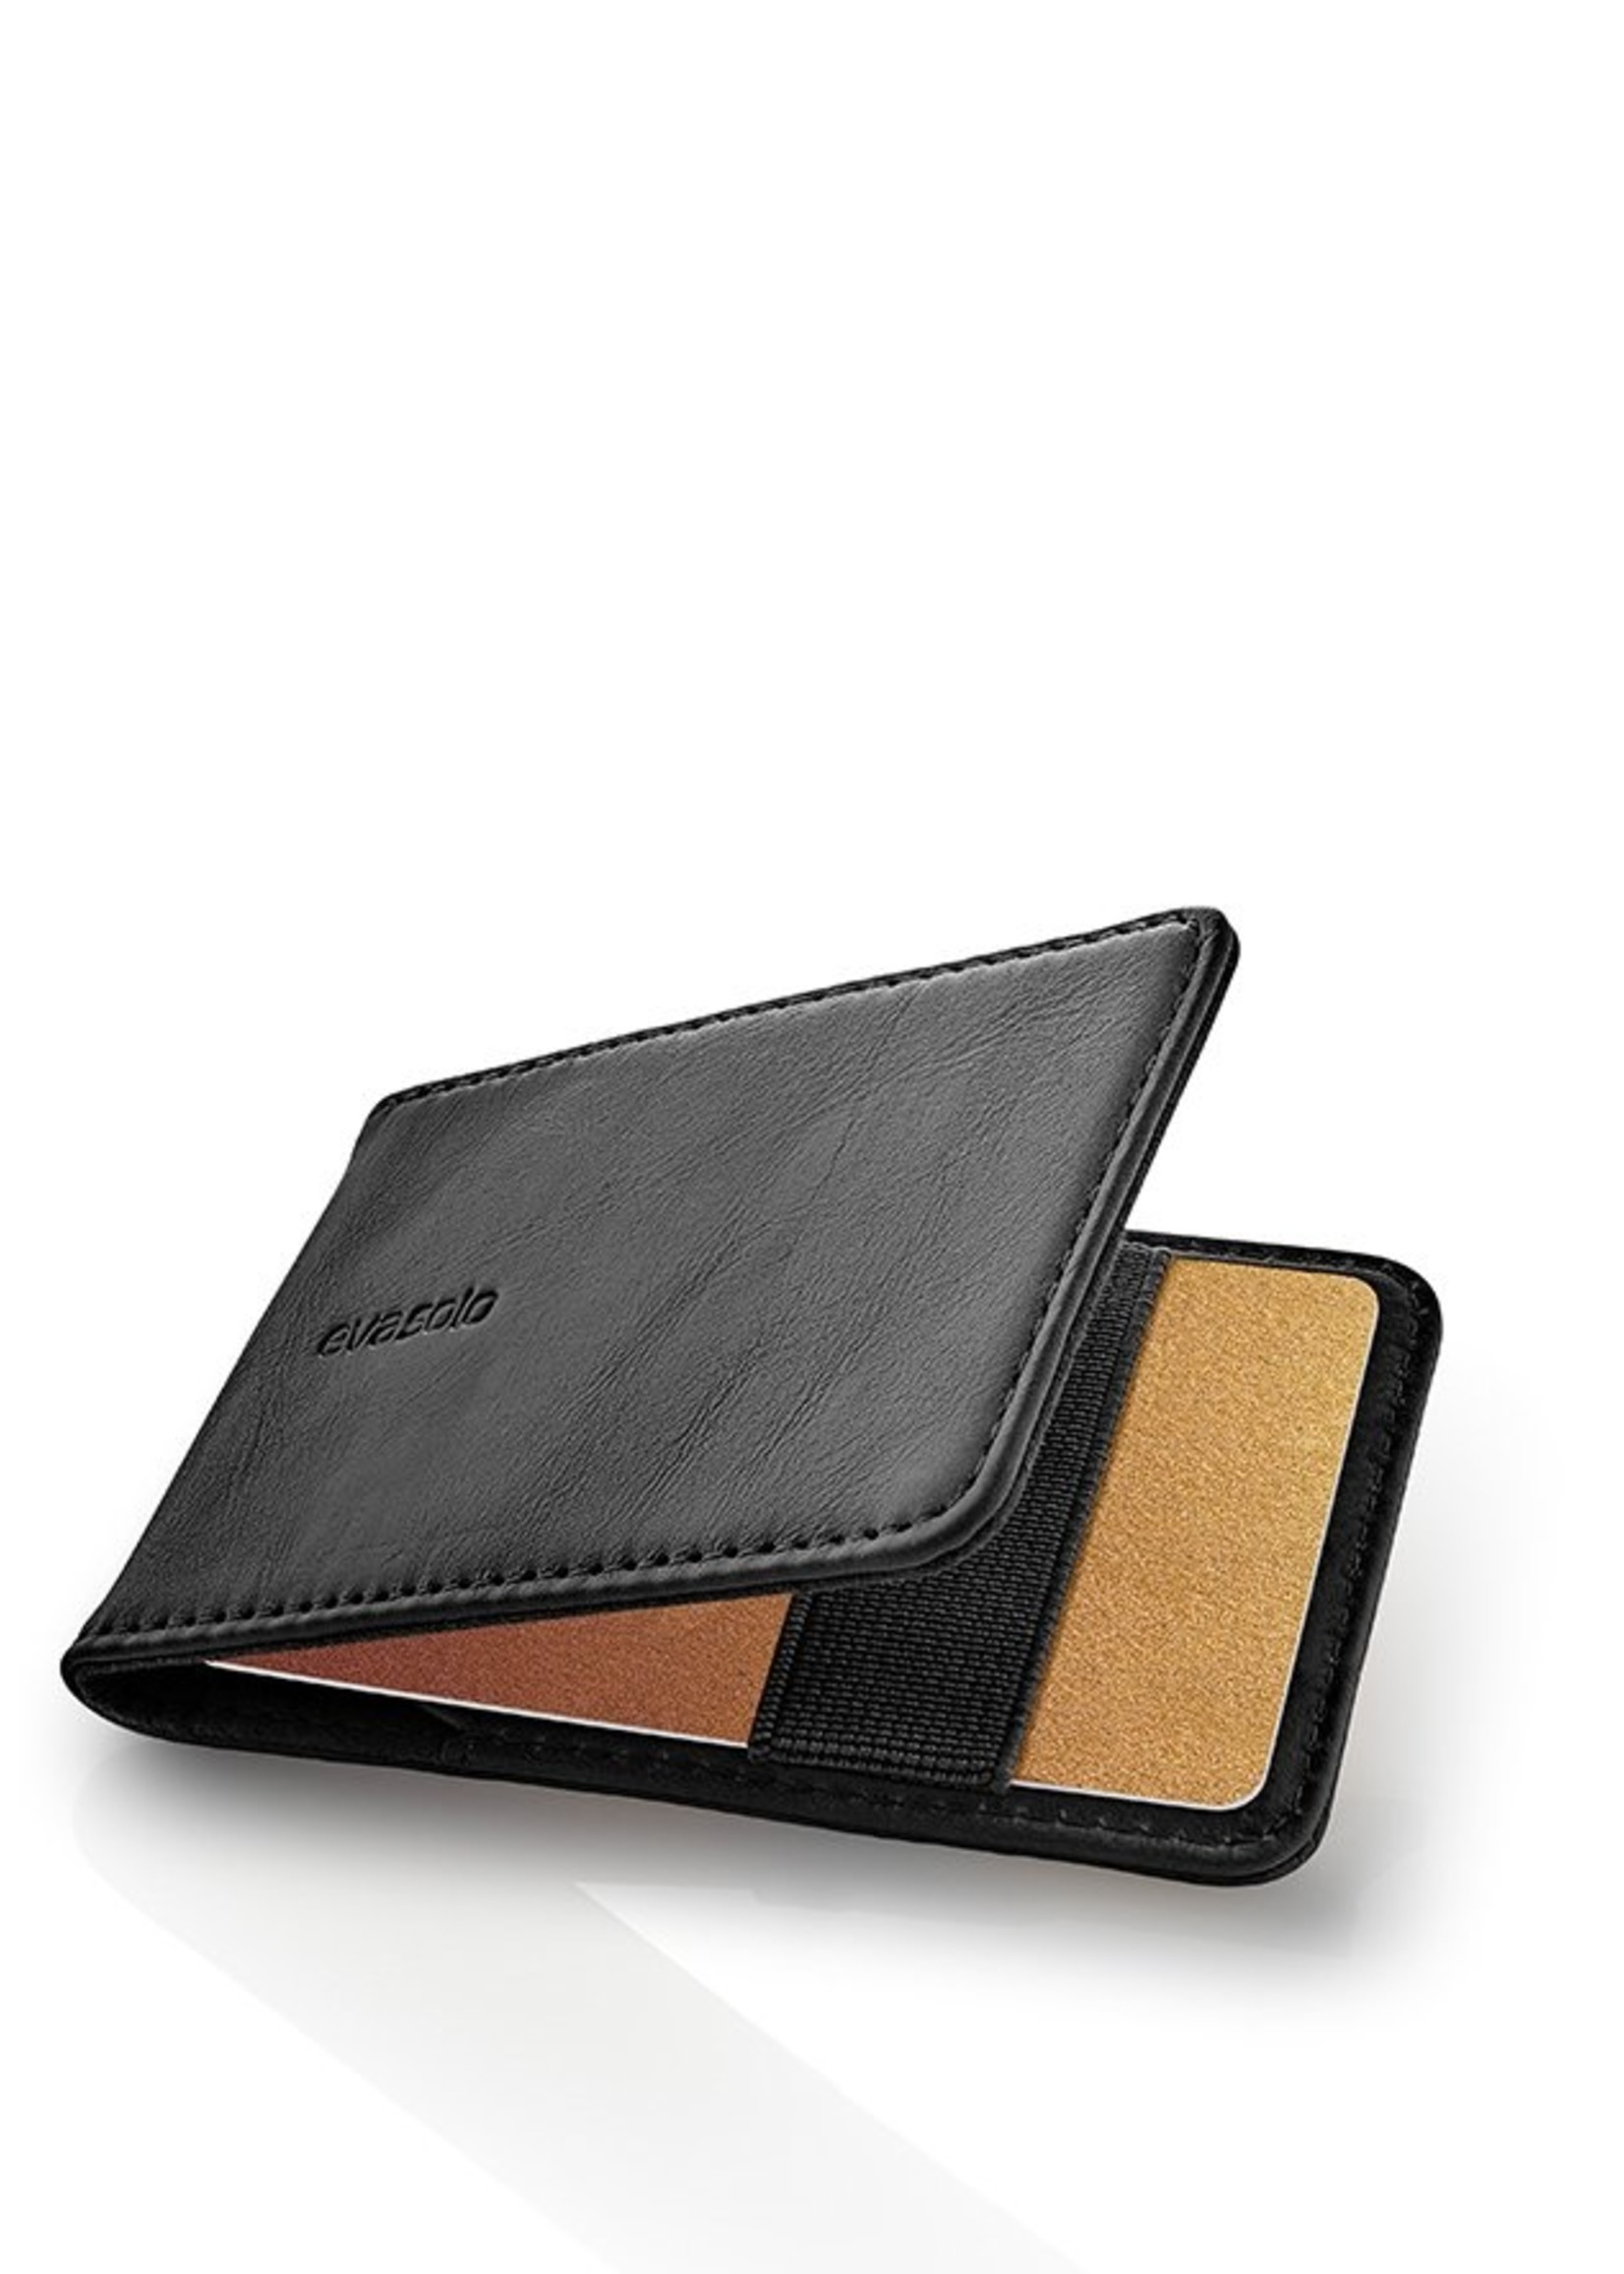 Eva Solo Credit card houder zwart